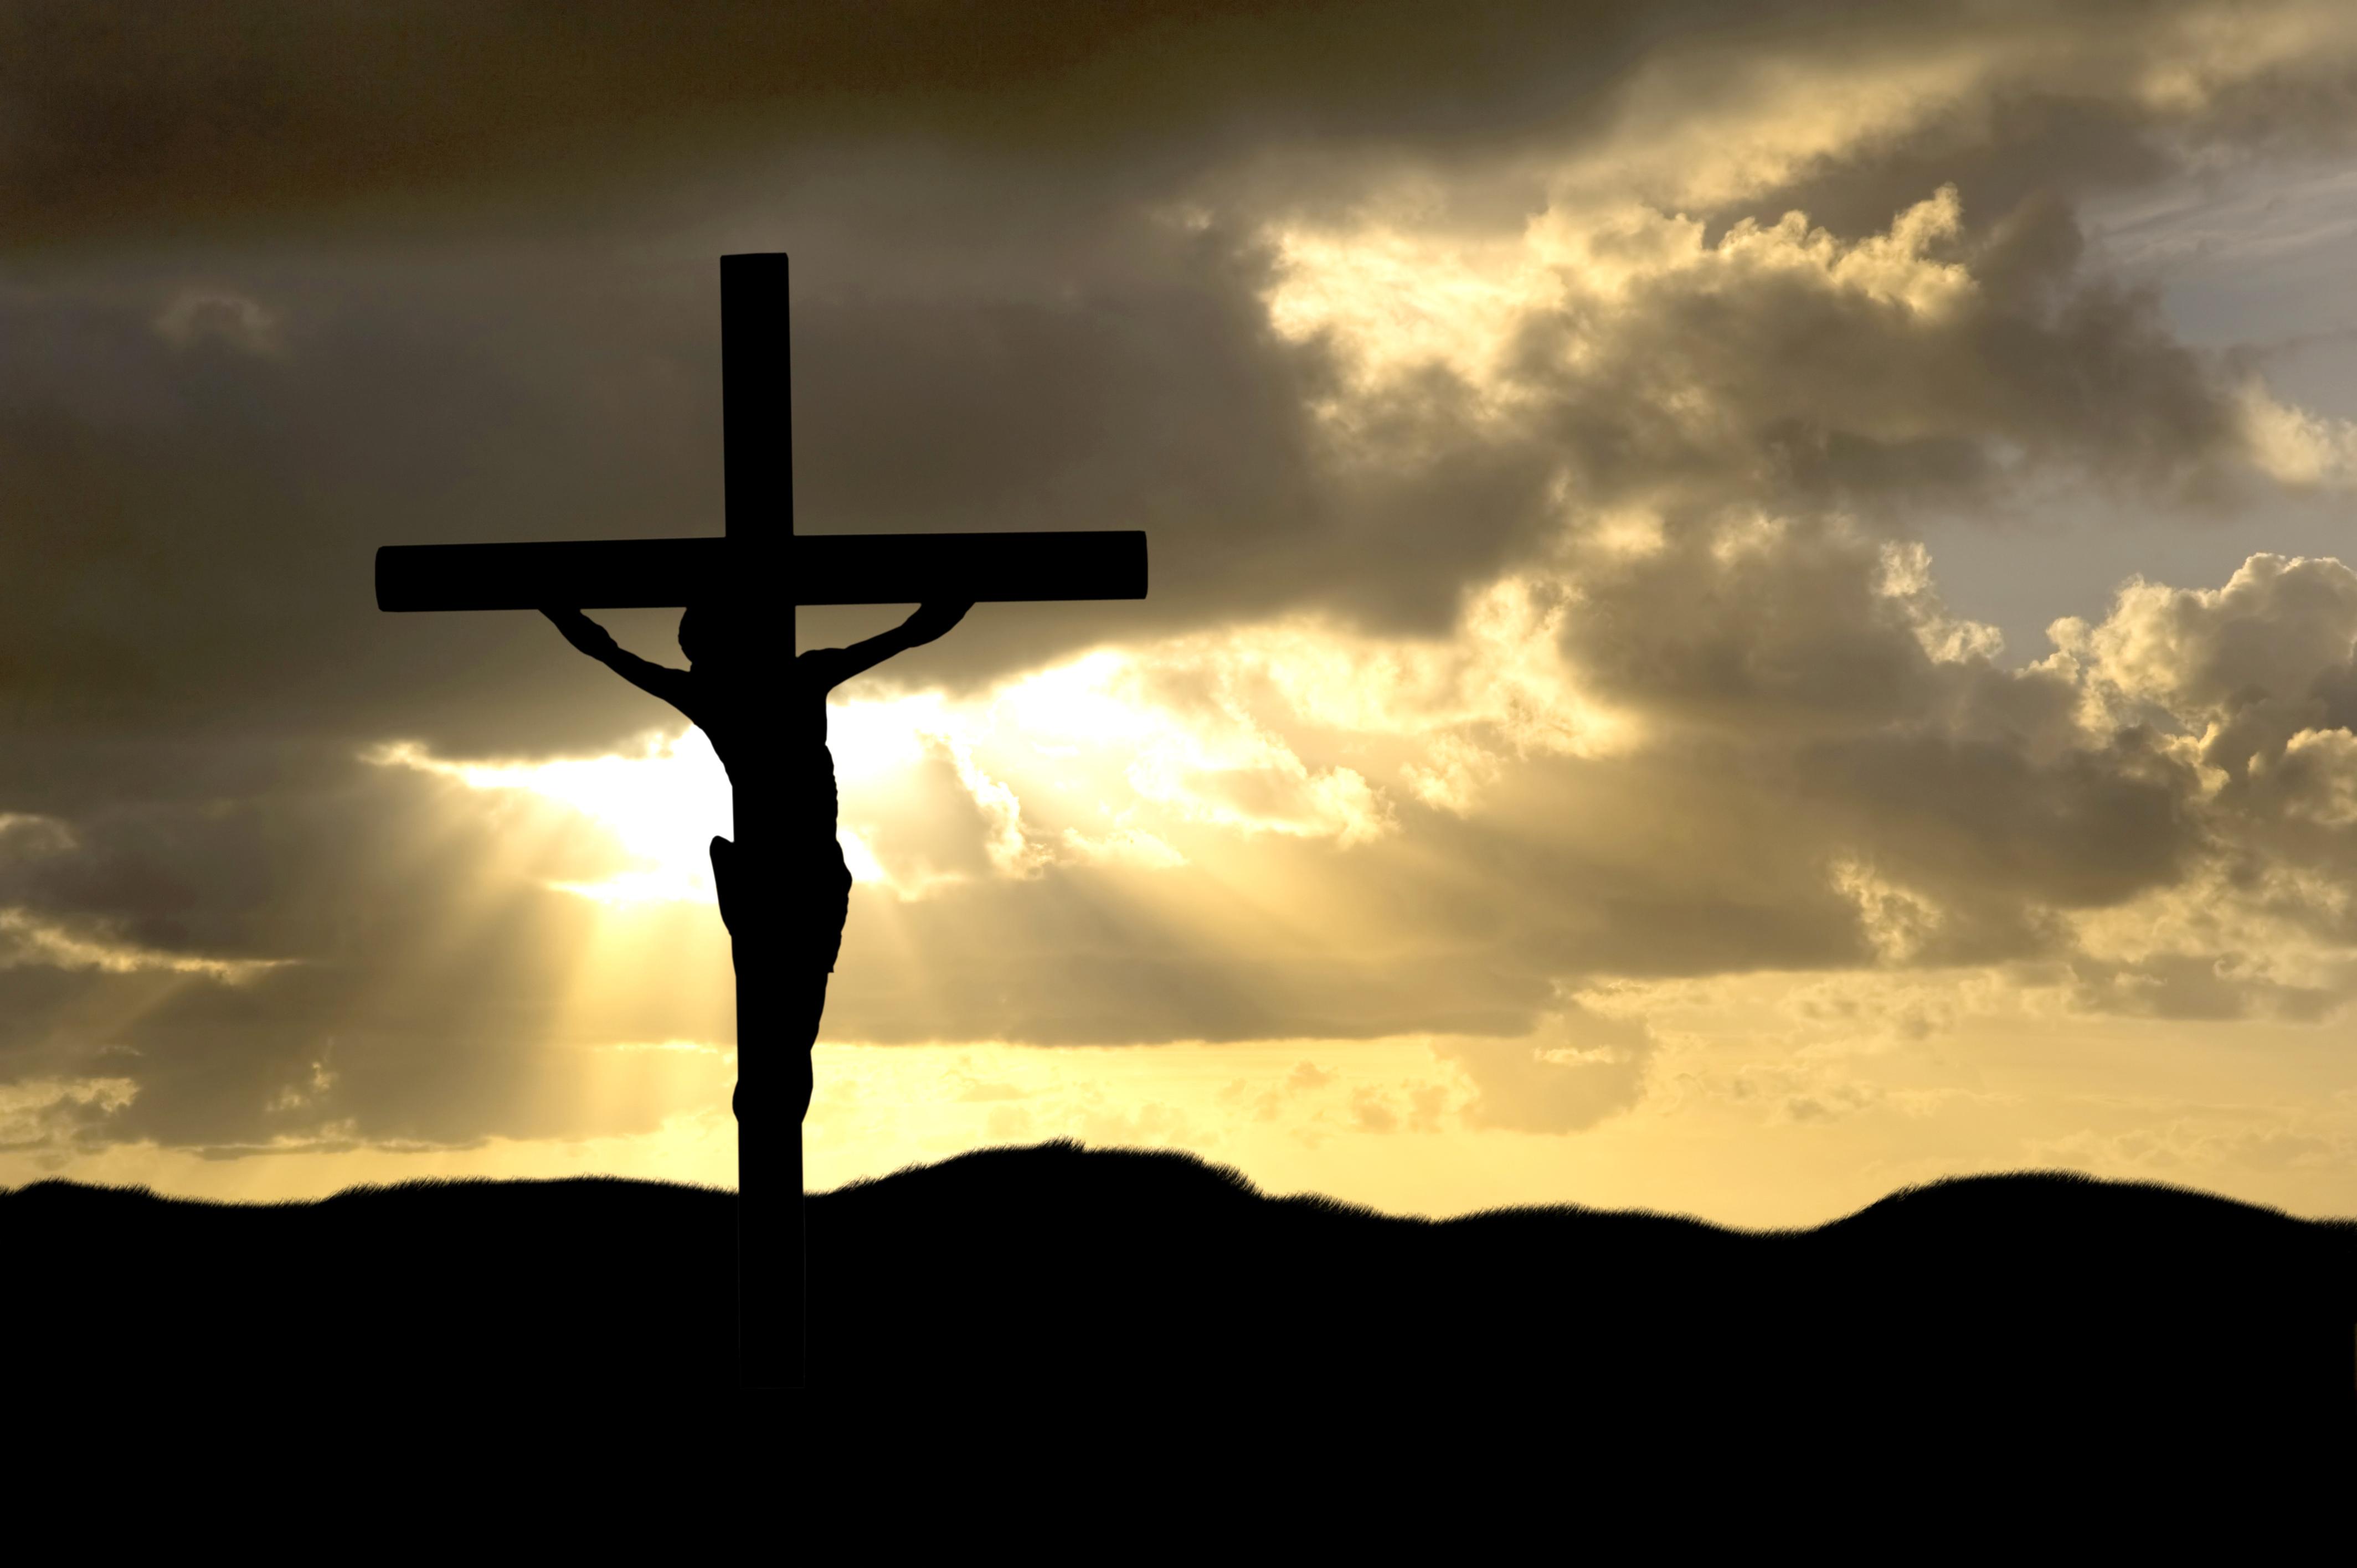 Wallpaper On the Cross Jesus 4256x2832